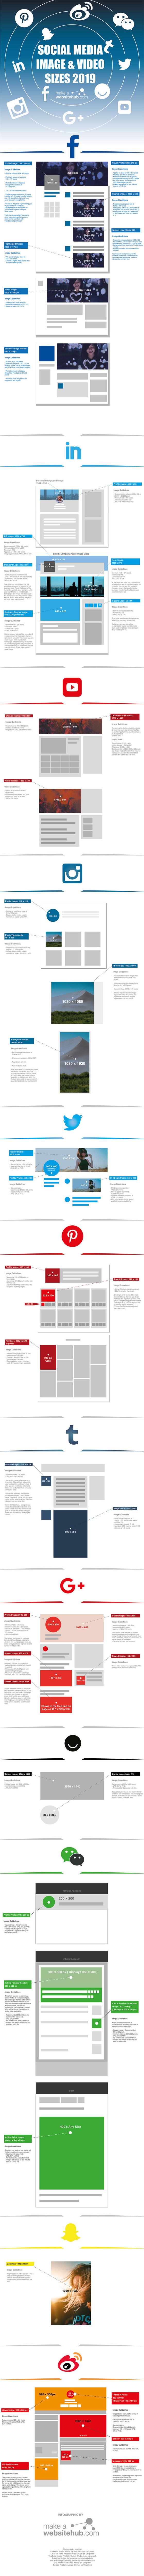 social-media-image-sizes-2019